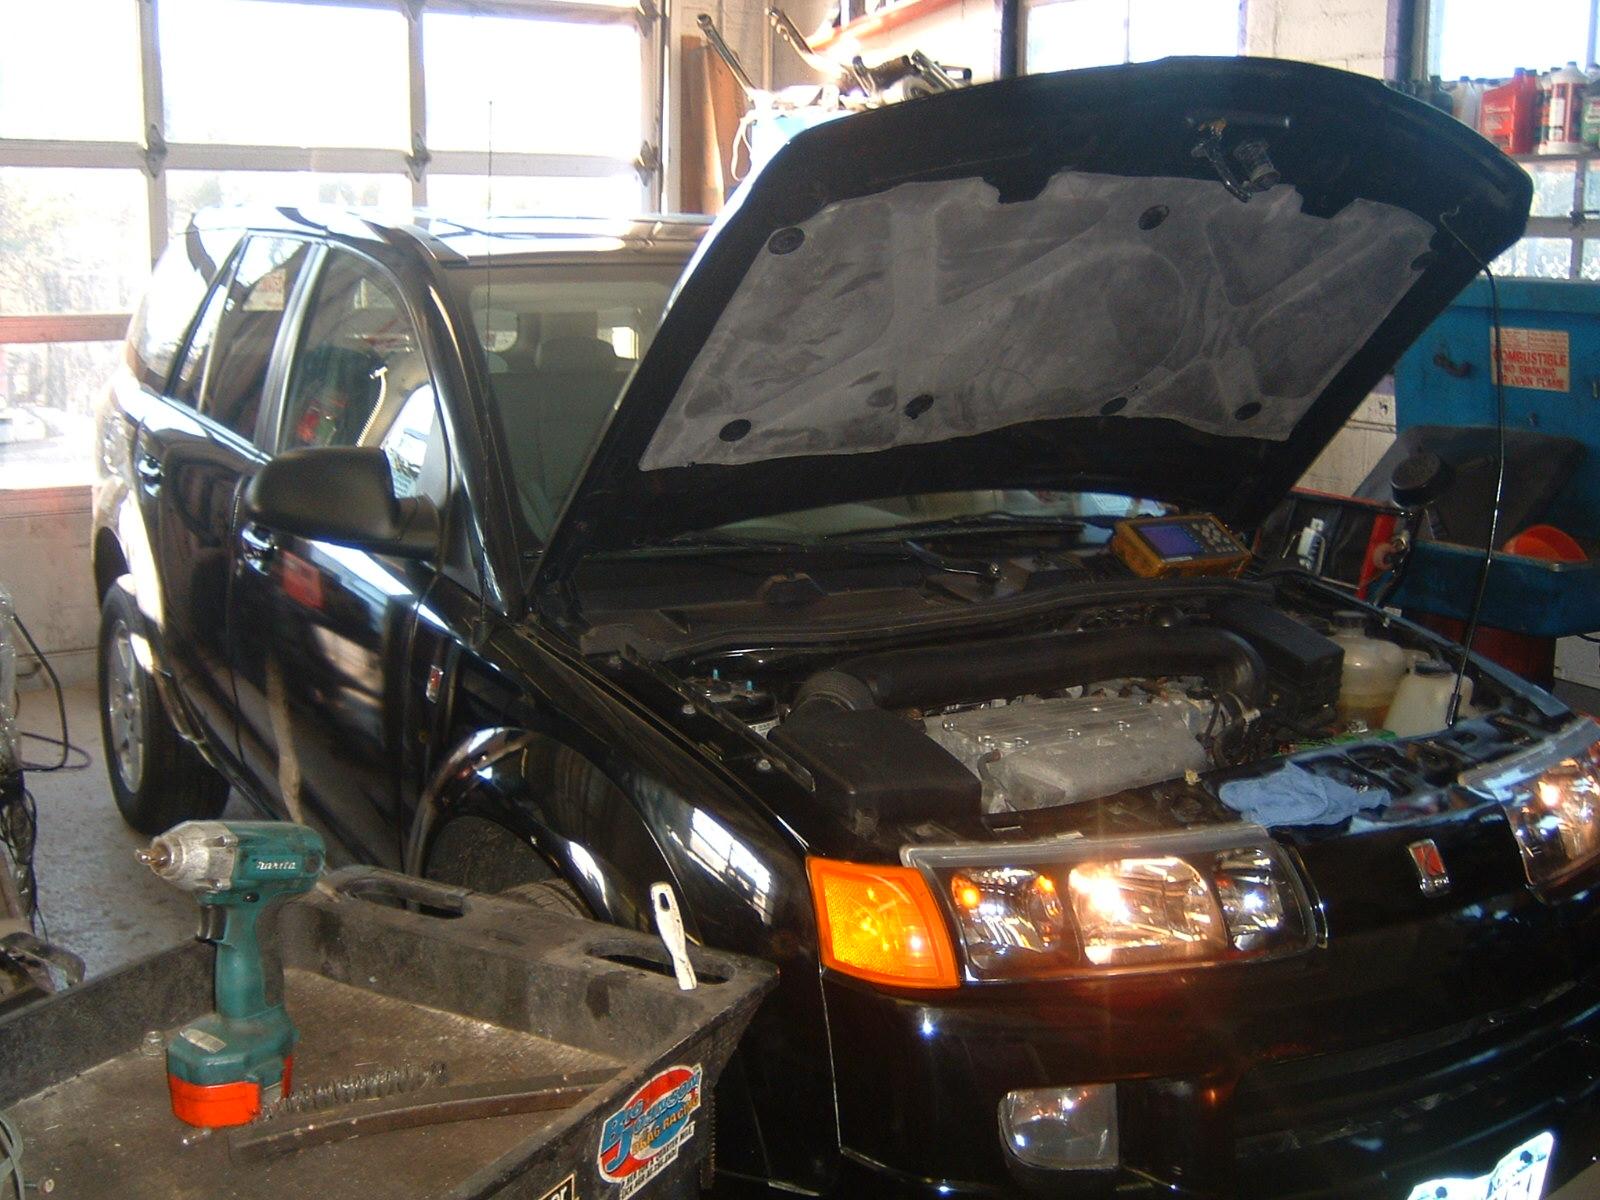 JWR Automotive Diagnostics: 2004 Saturn Vue 3.5L